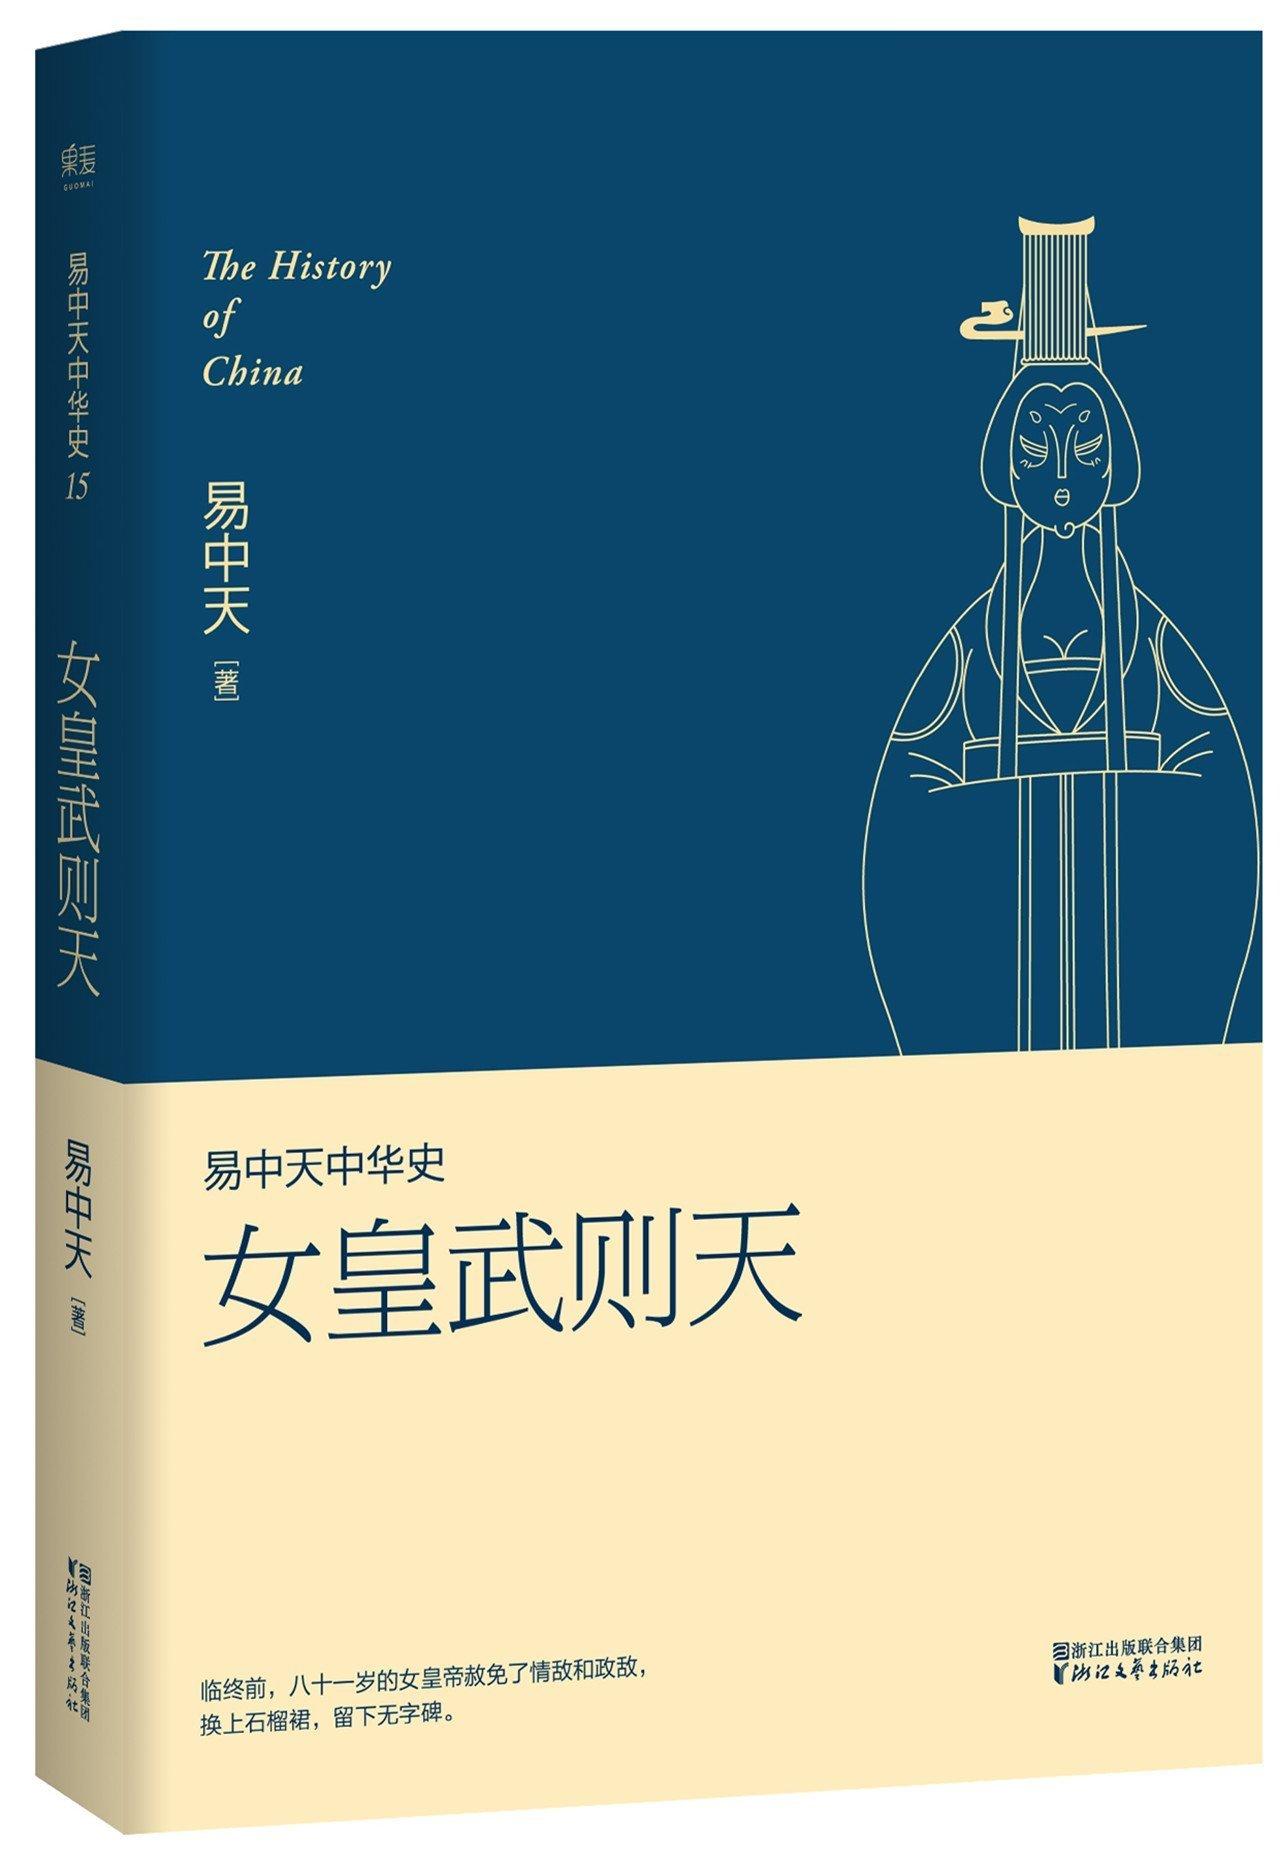 The History of China: Empress Wu Zetian (15th Volume) (Chinese Edition) pdf